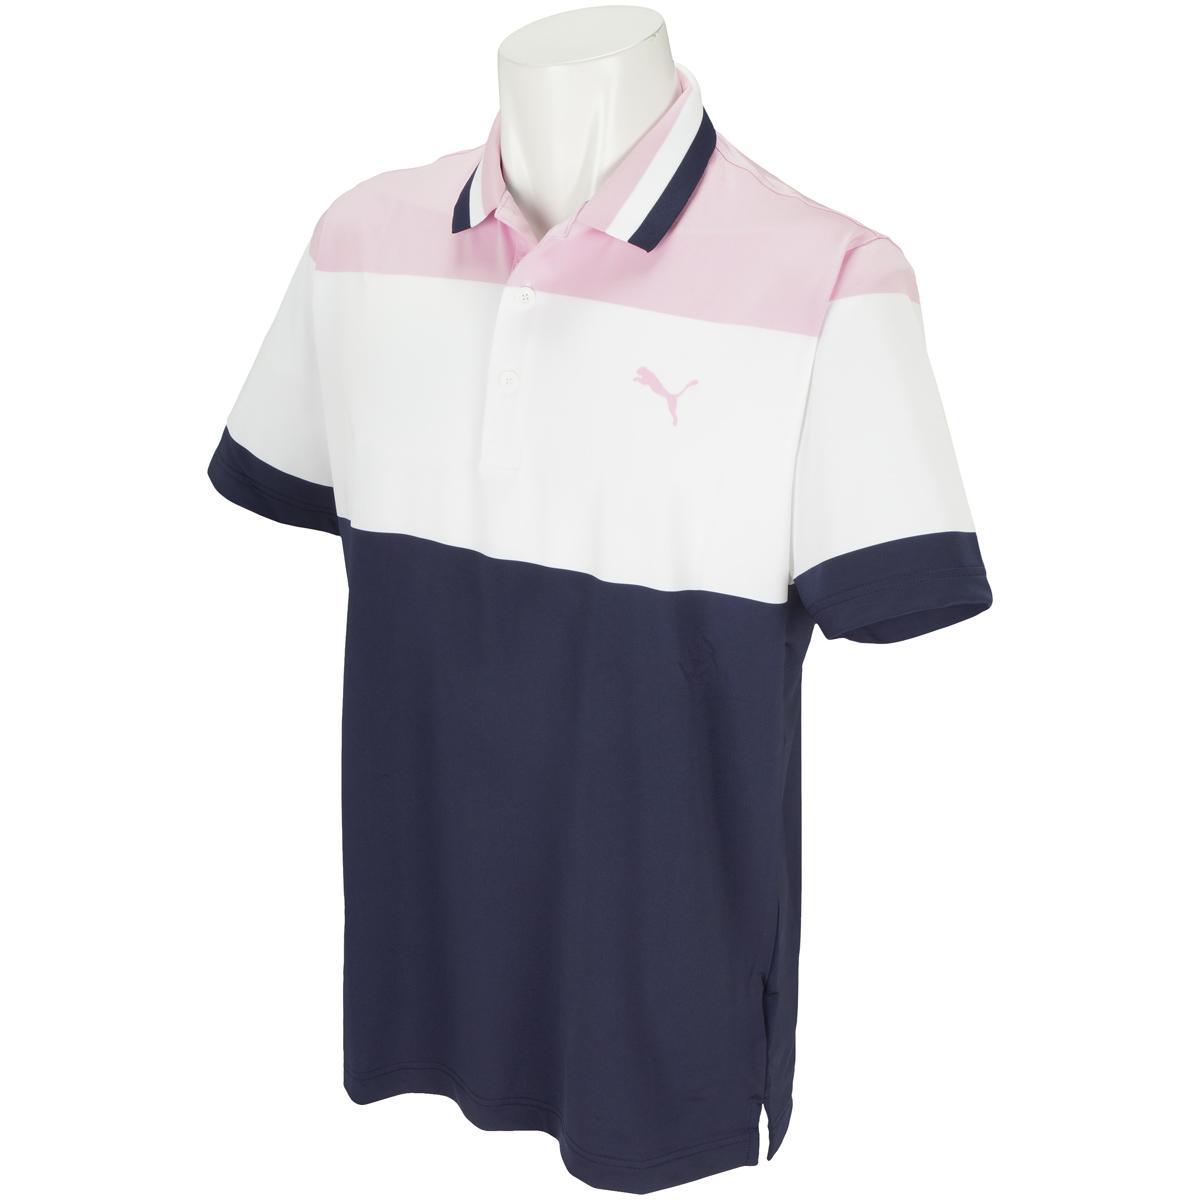 GDO限定 ナインティーズ 半袖ポロシャツ